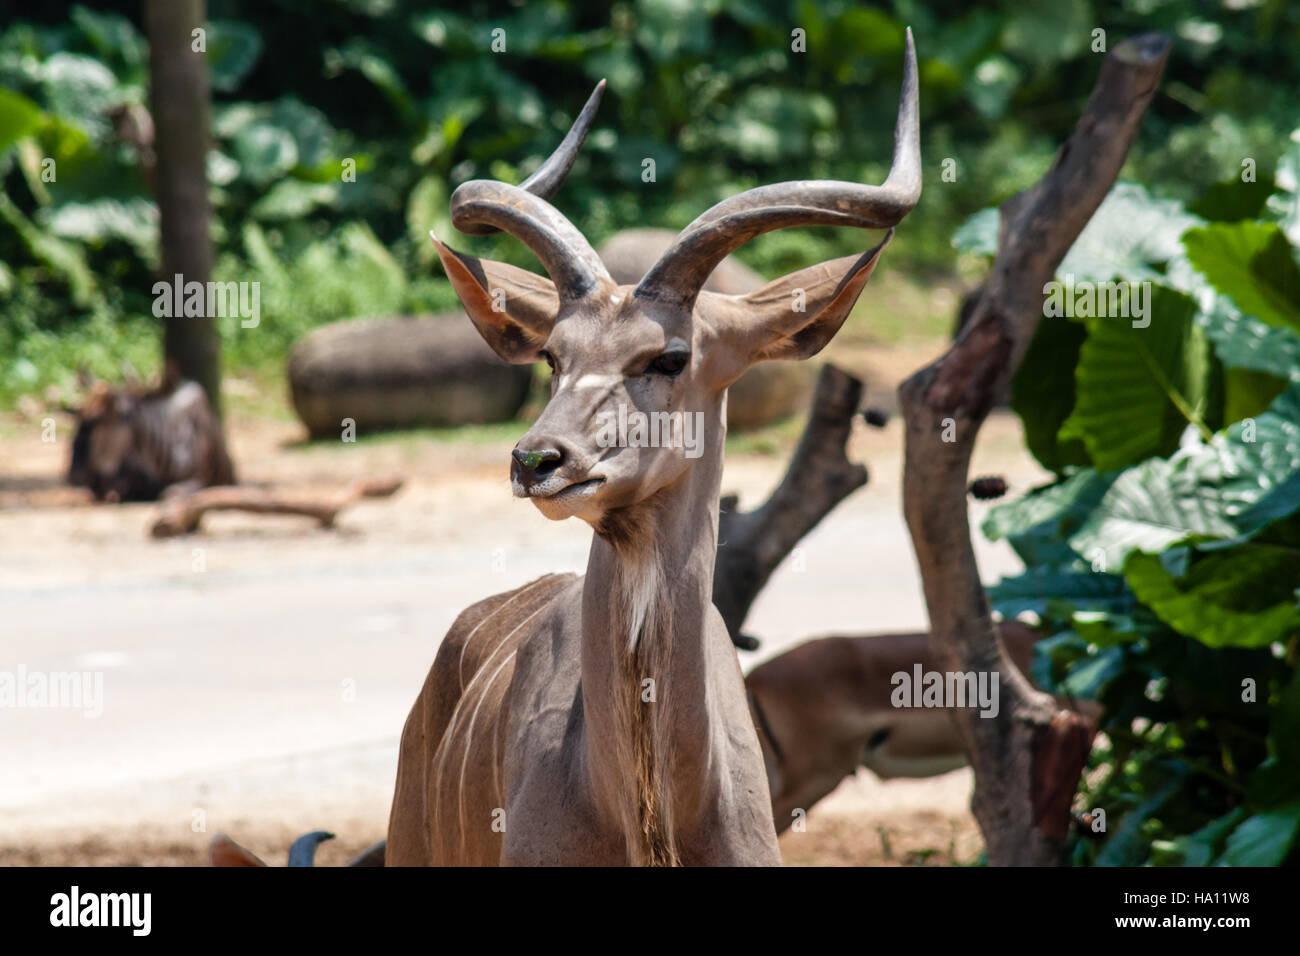 The Wild Antelope Family Grass Greater Kudu - Stock Image